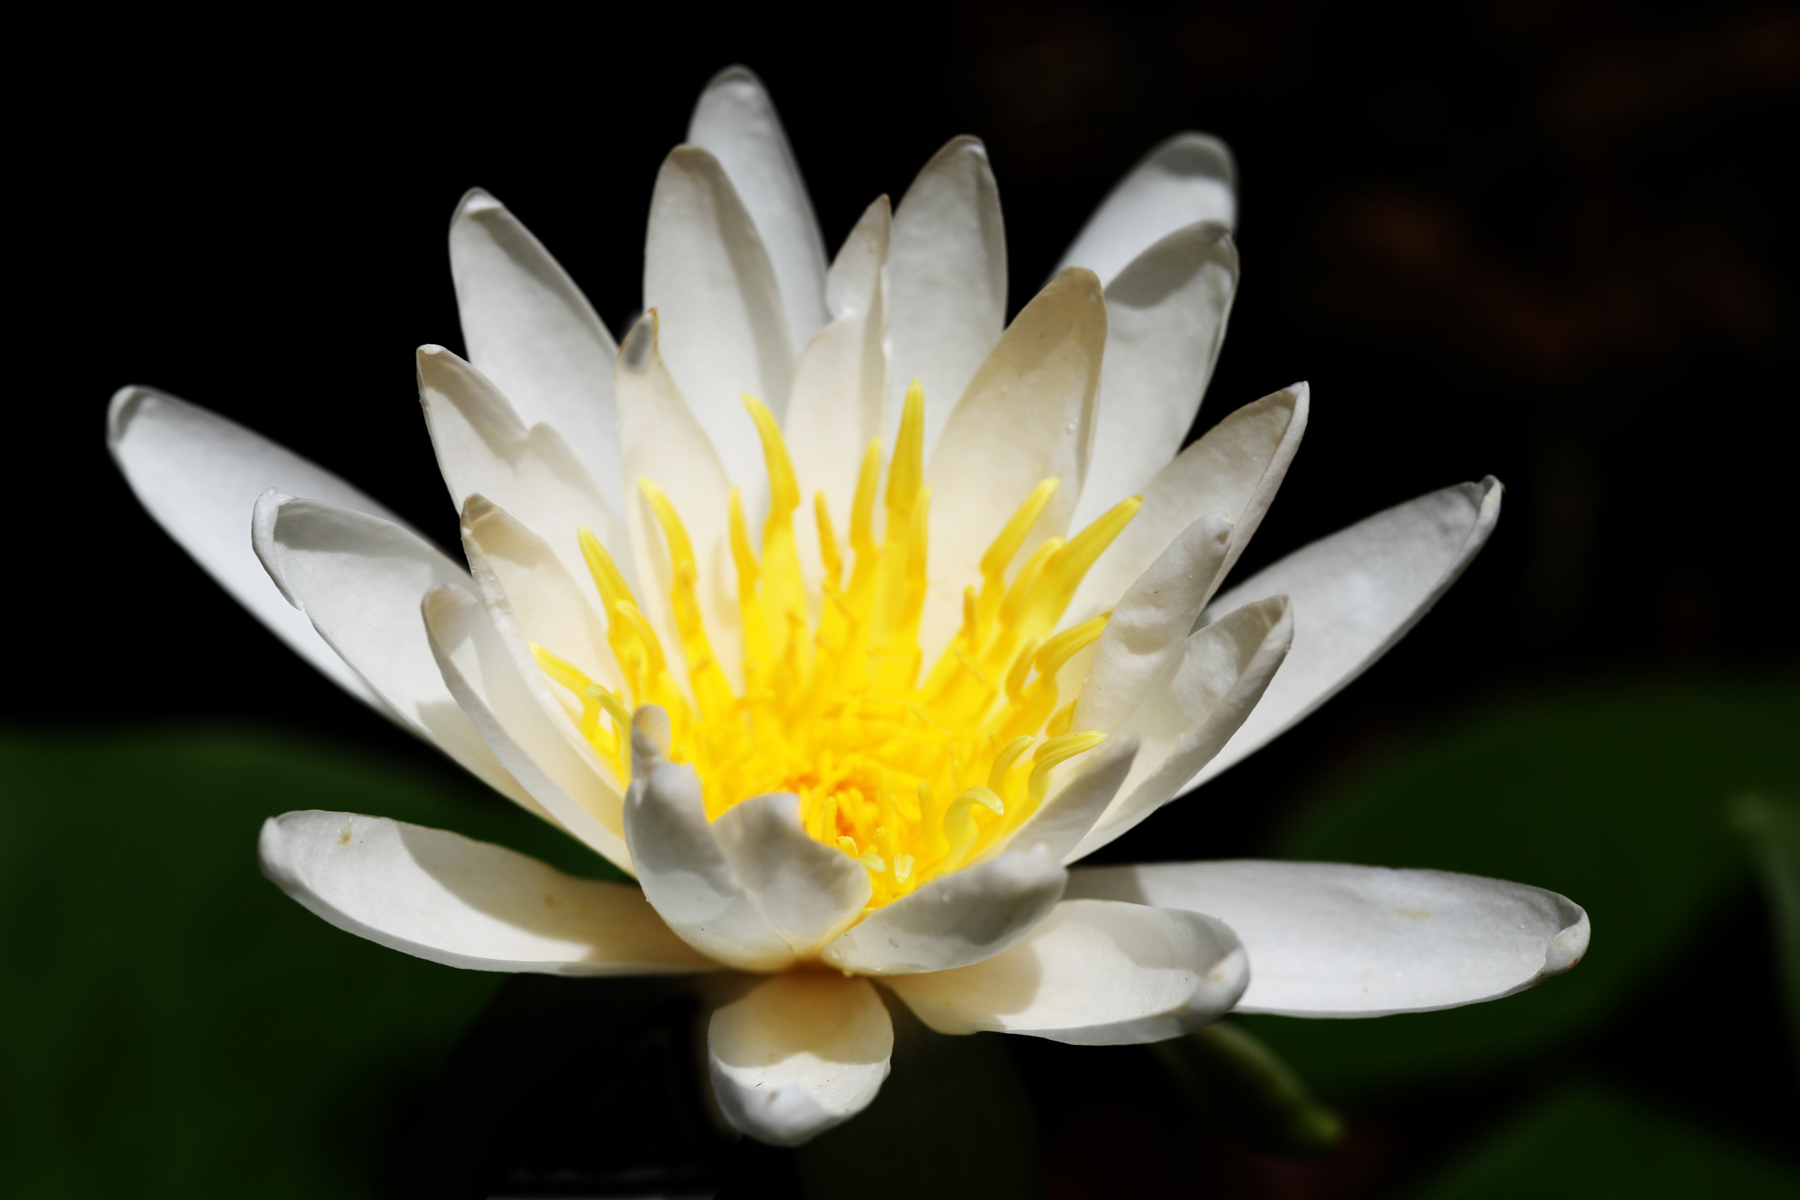 stunning shot of a flourishing water lilly